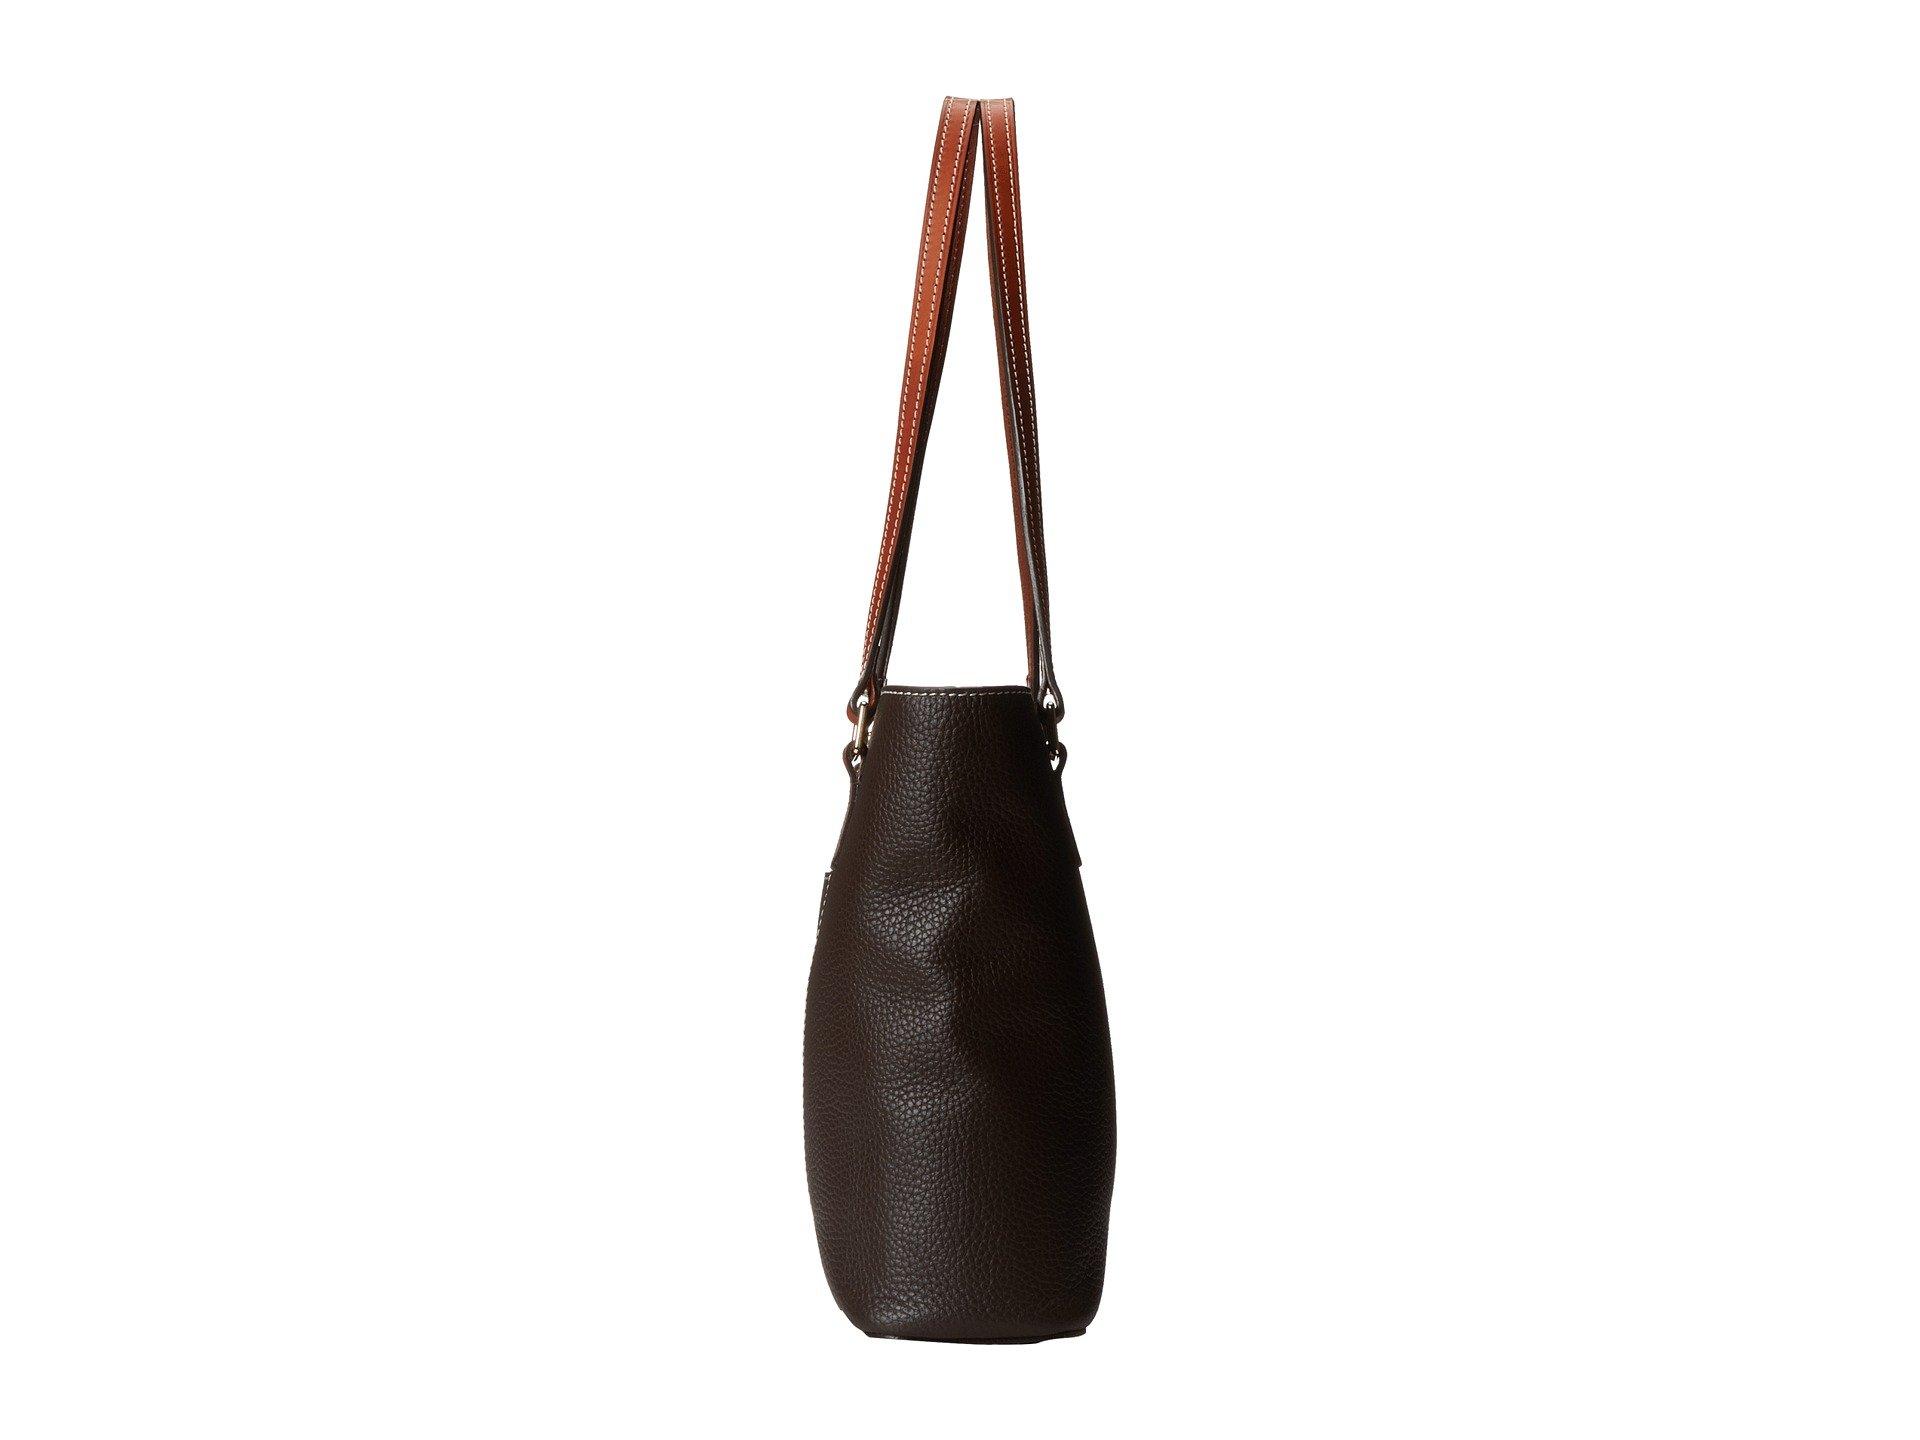 Bourke Tan Small Lexington amp; Dooney Shopper W Chocolate Pebble Trim 8t544xq